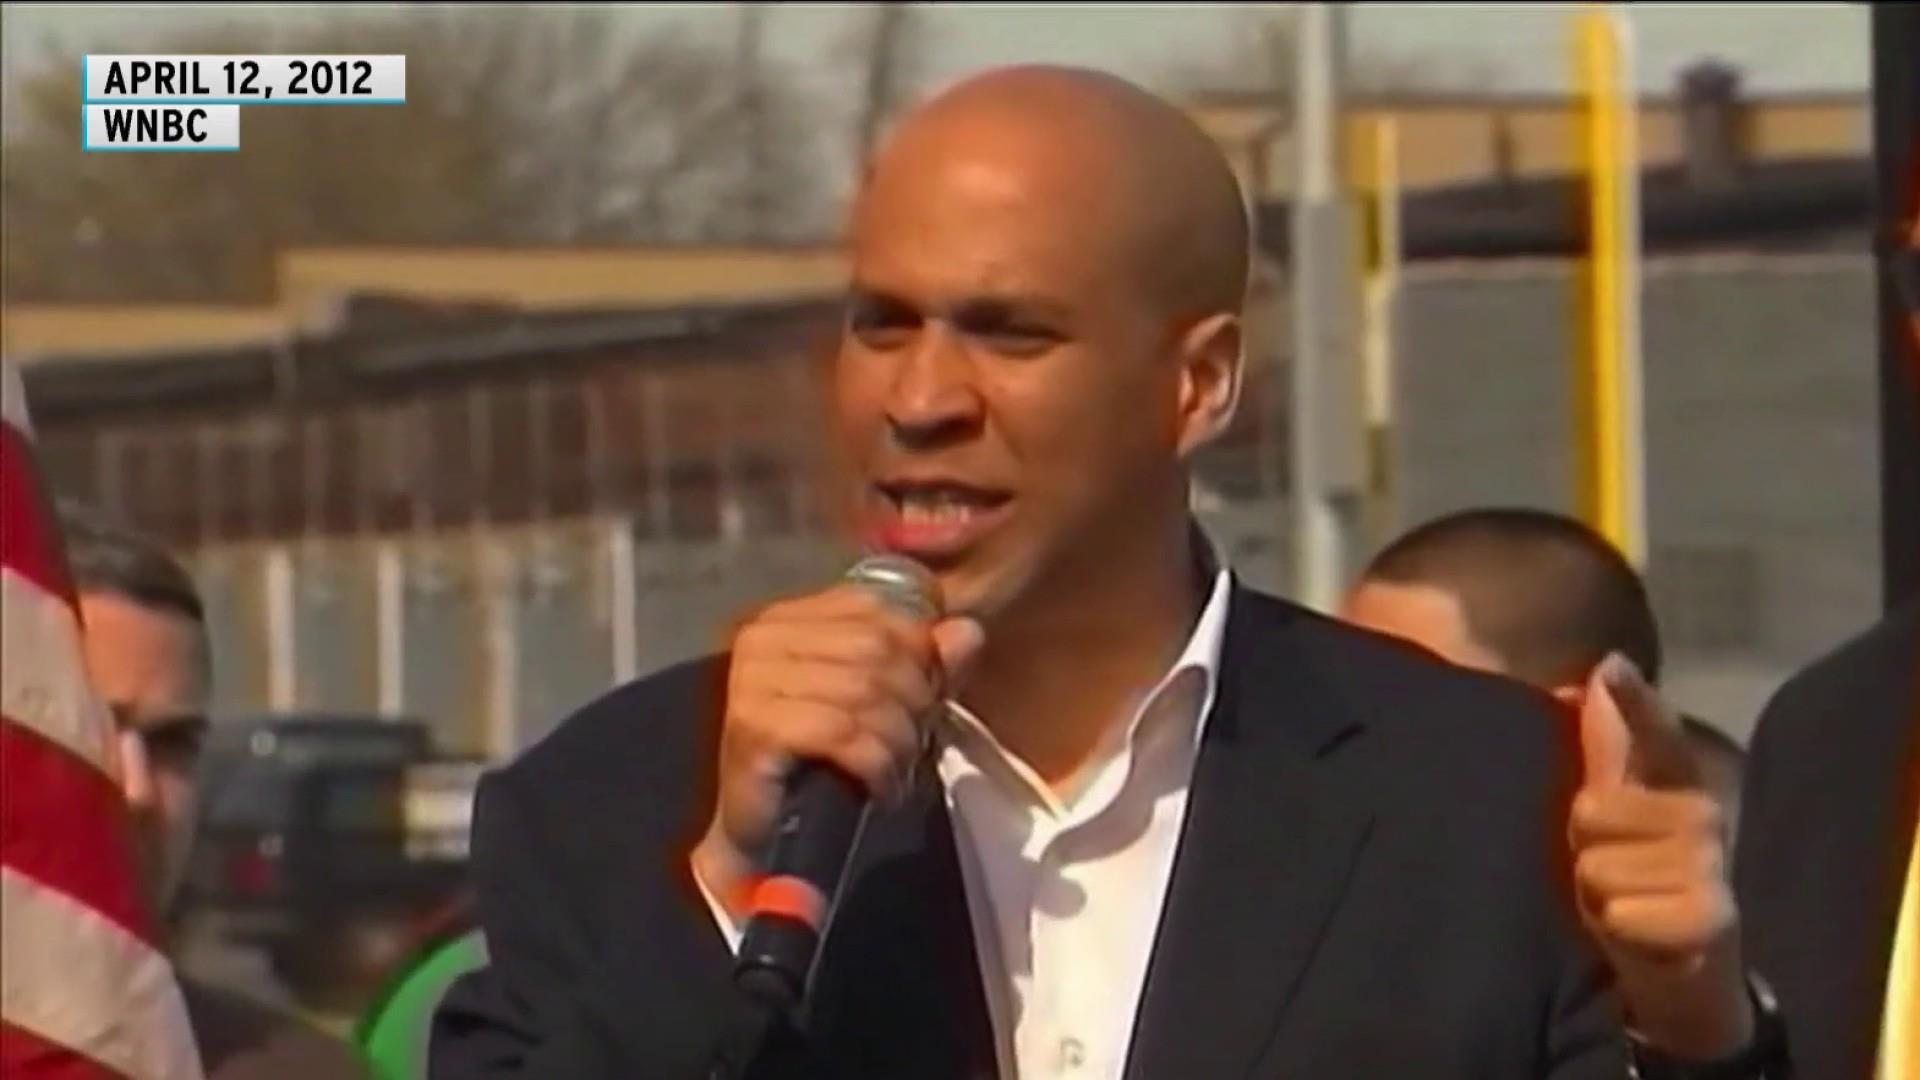 Booker brings unique energy, optimism to 2020 race